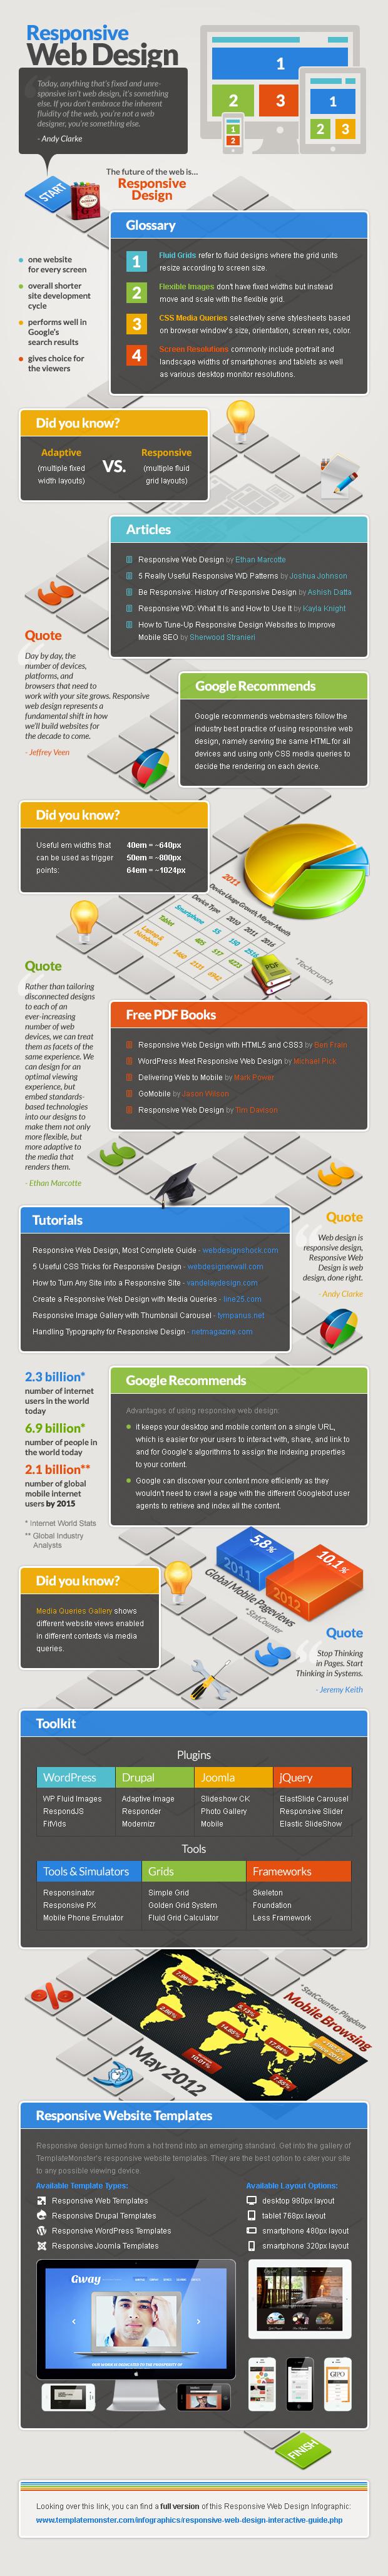 Responsive-Web-Design-Infographic-jpg-version